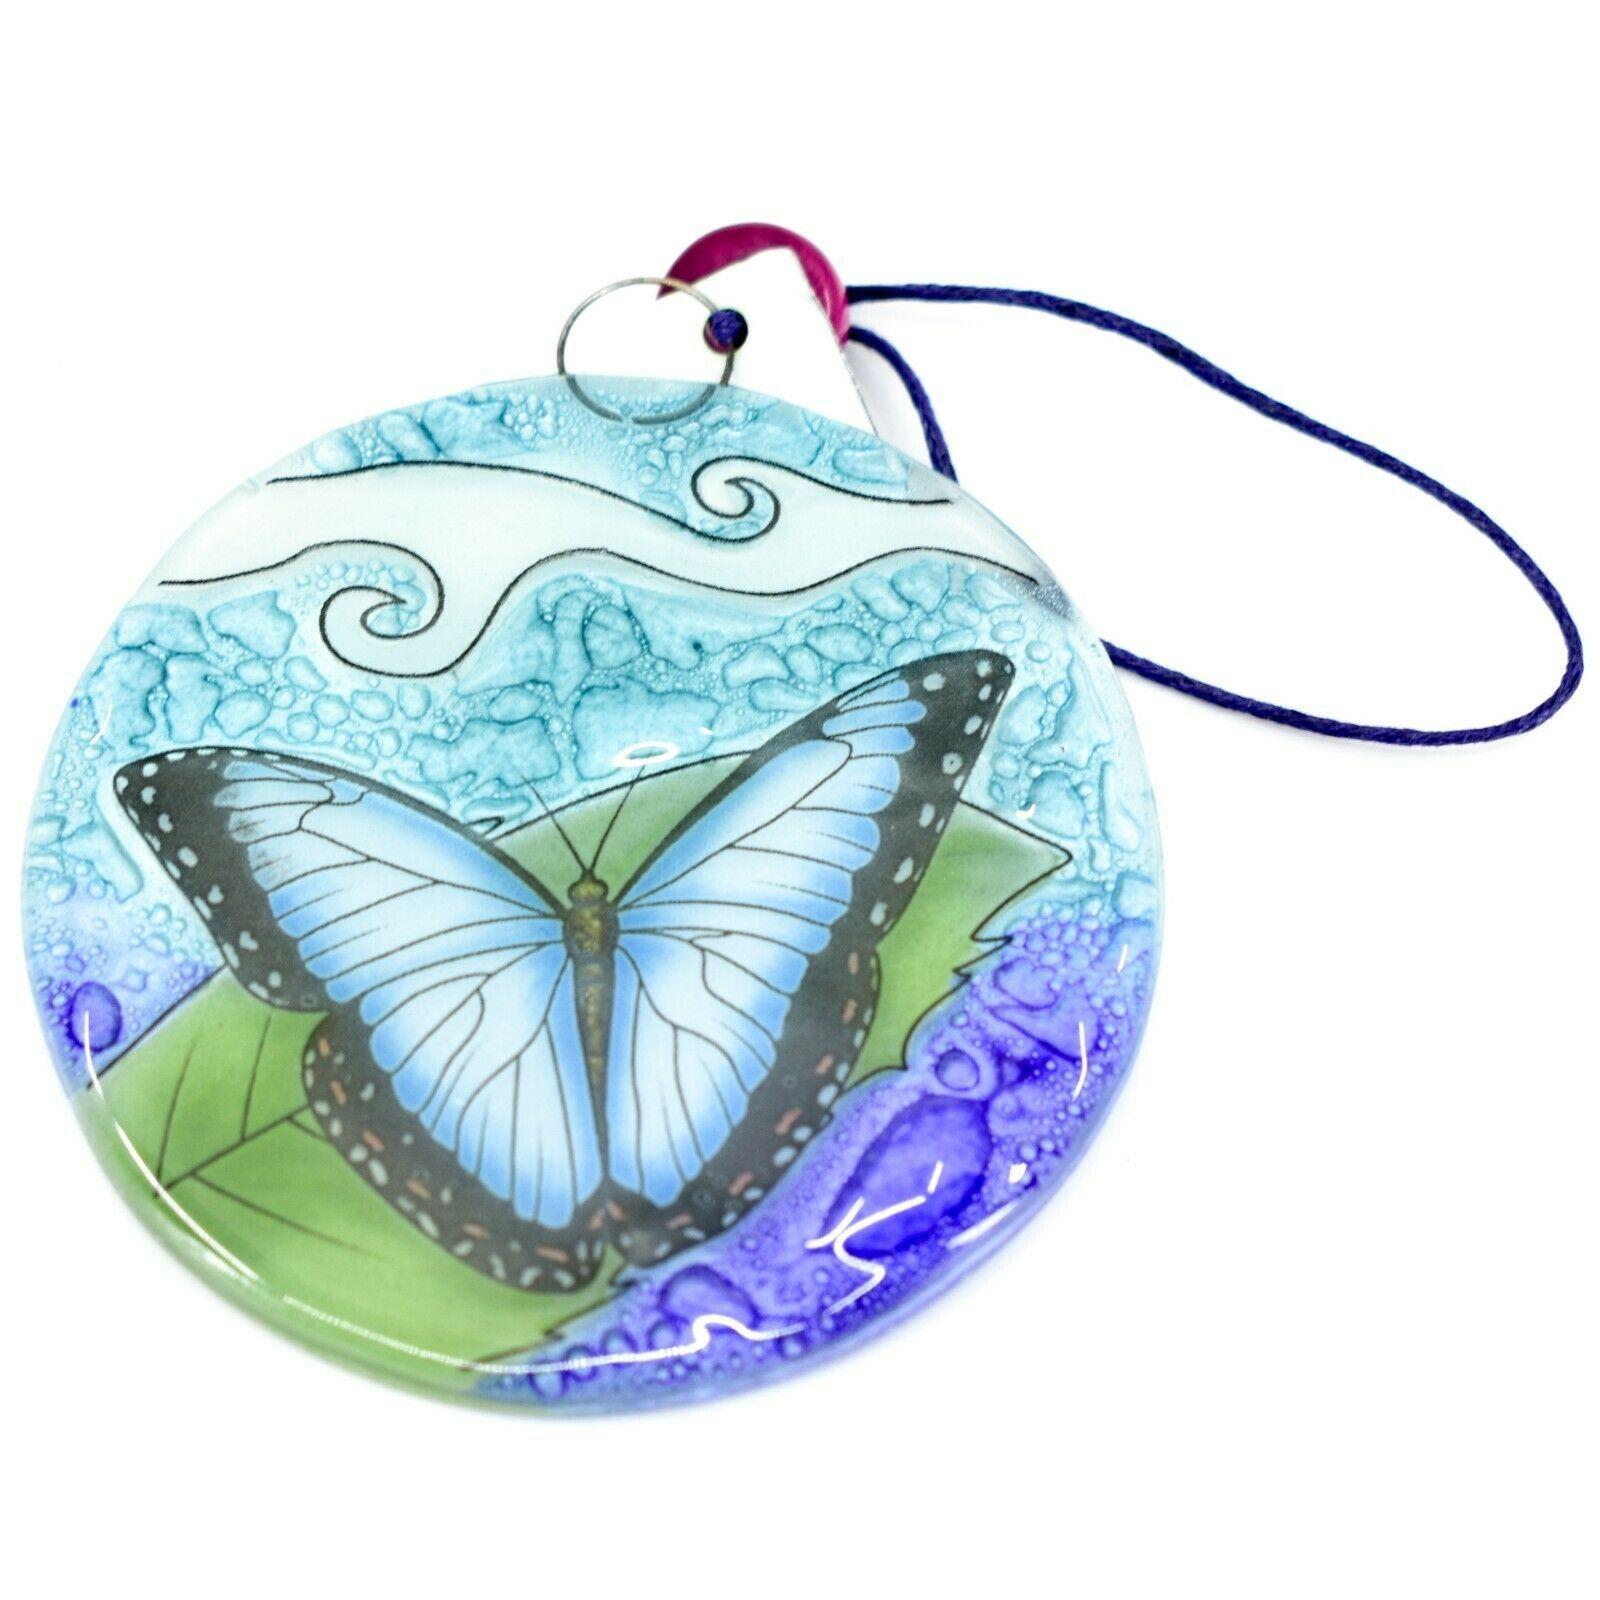 Fused Art Glass Blue Morph Butterfly Ornament Handmade in Ecuador